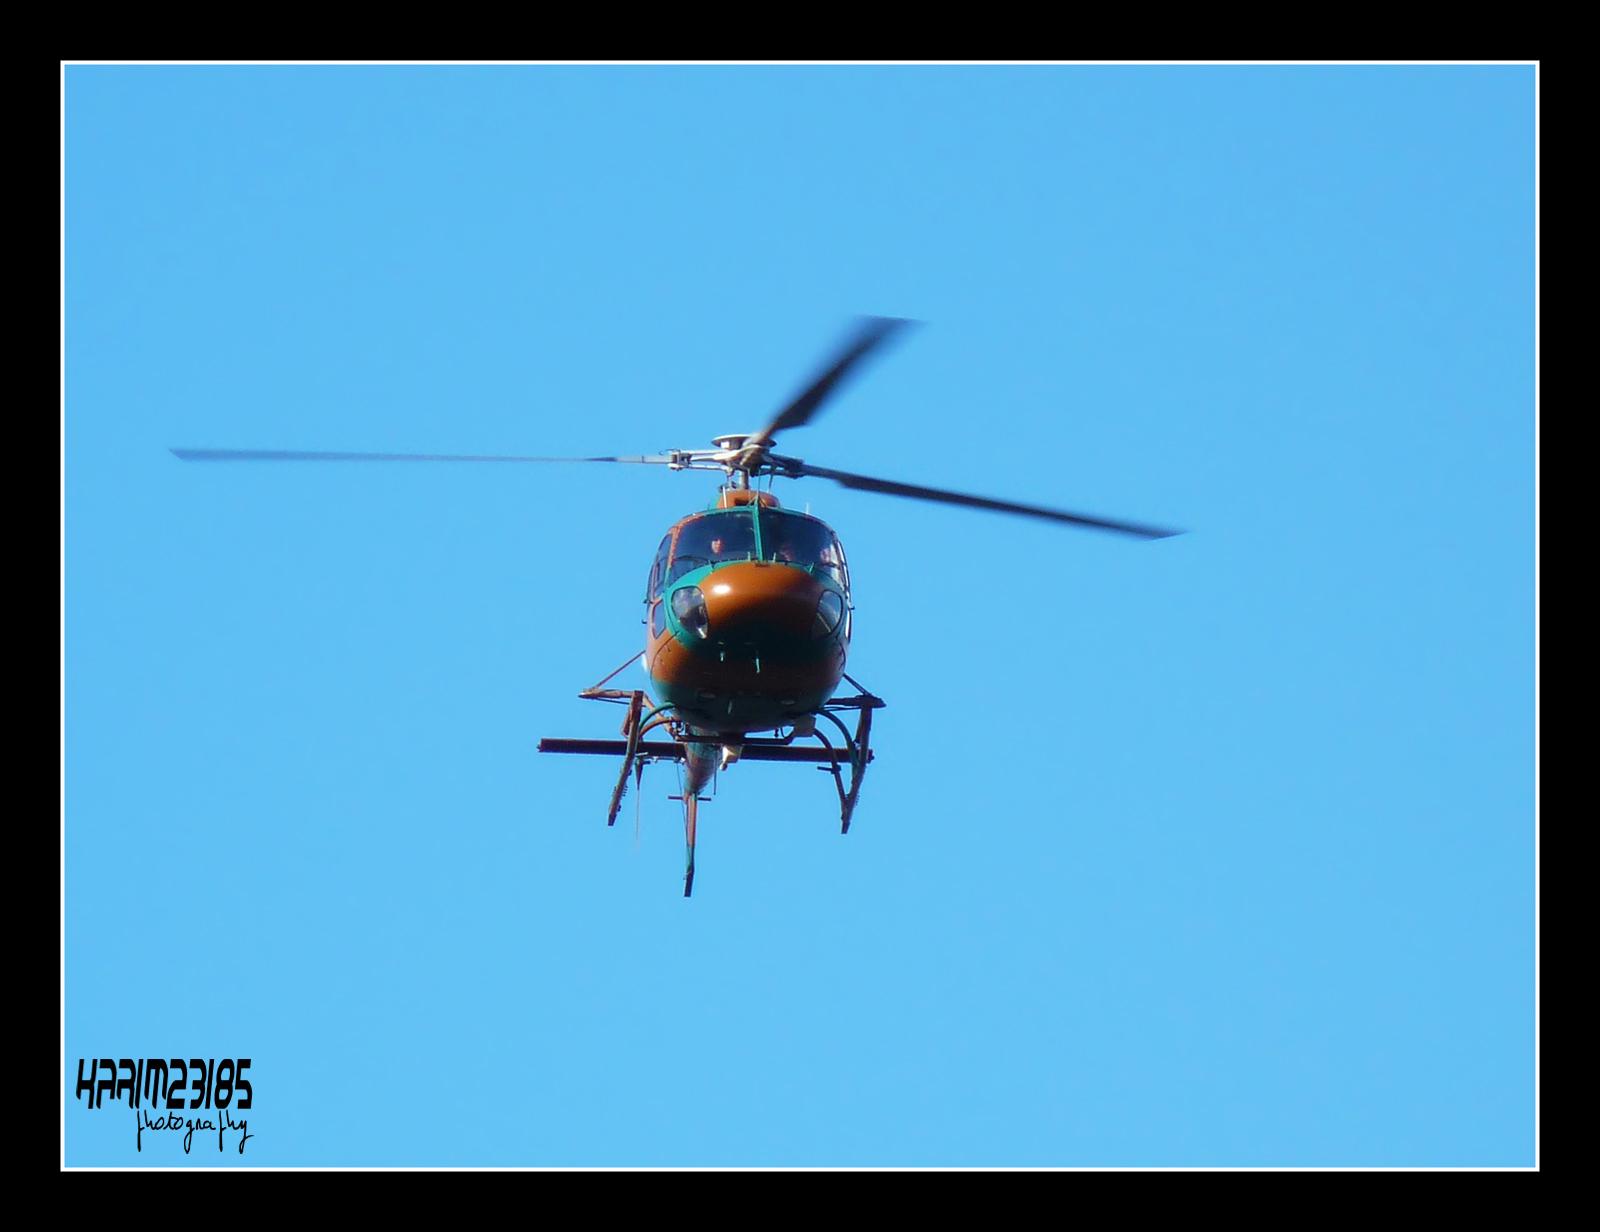 صور مروحيات القوات الجوية الجزائرية Ecureuil/Fennec ] AS-355N2 / AS-555N ] - صفحة 5 27360366136_2499e25e03_o